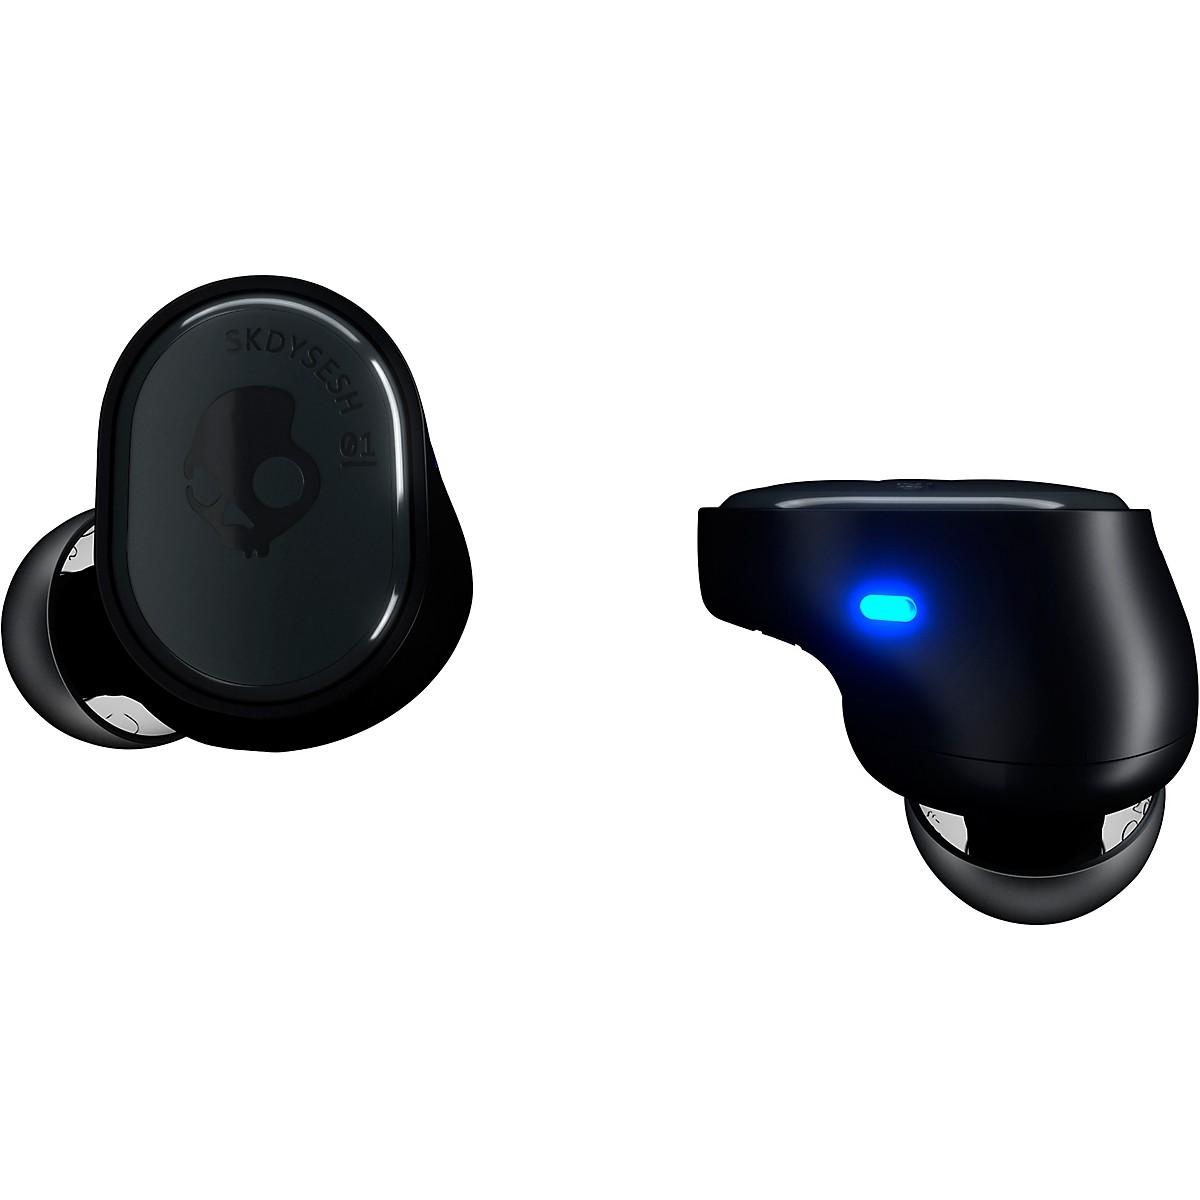 Skullcandy Sesh True Wireless Bluetooth Earbuds